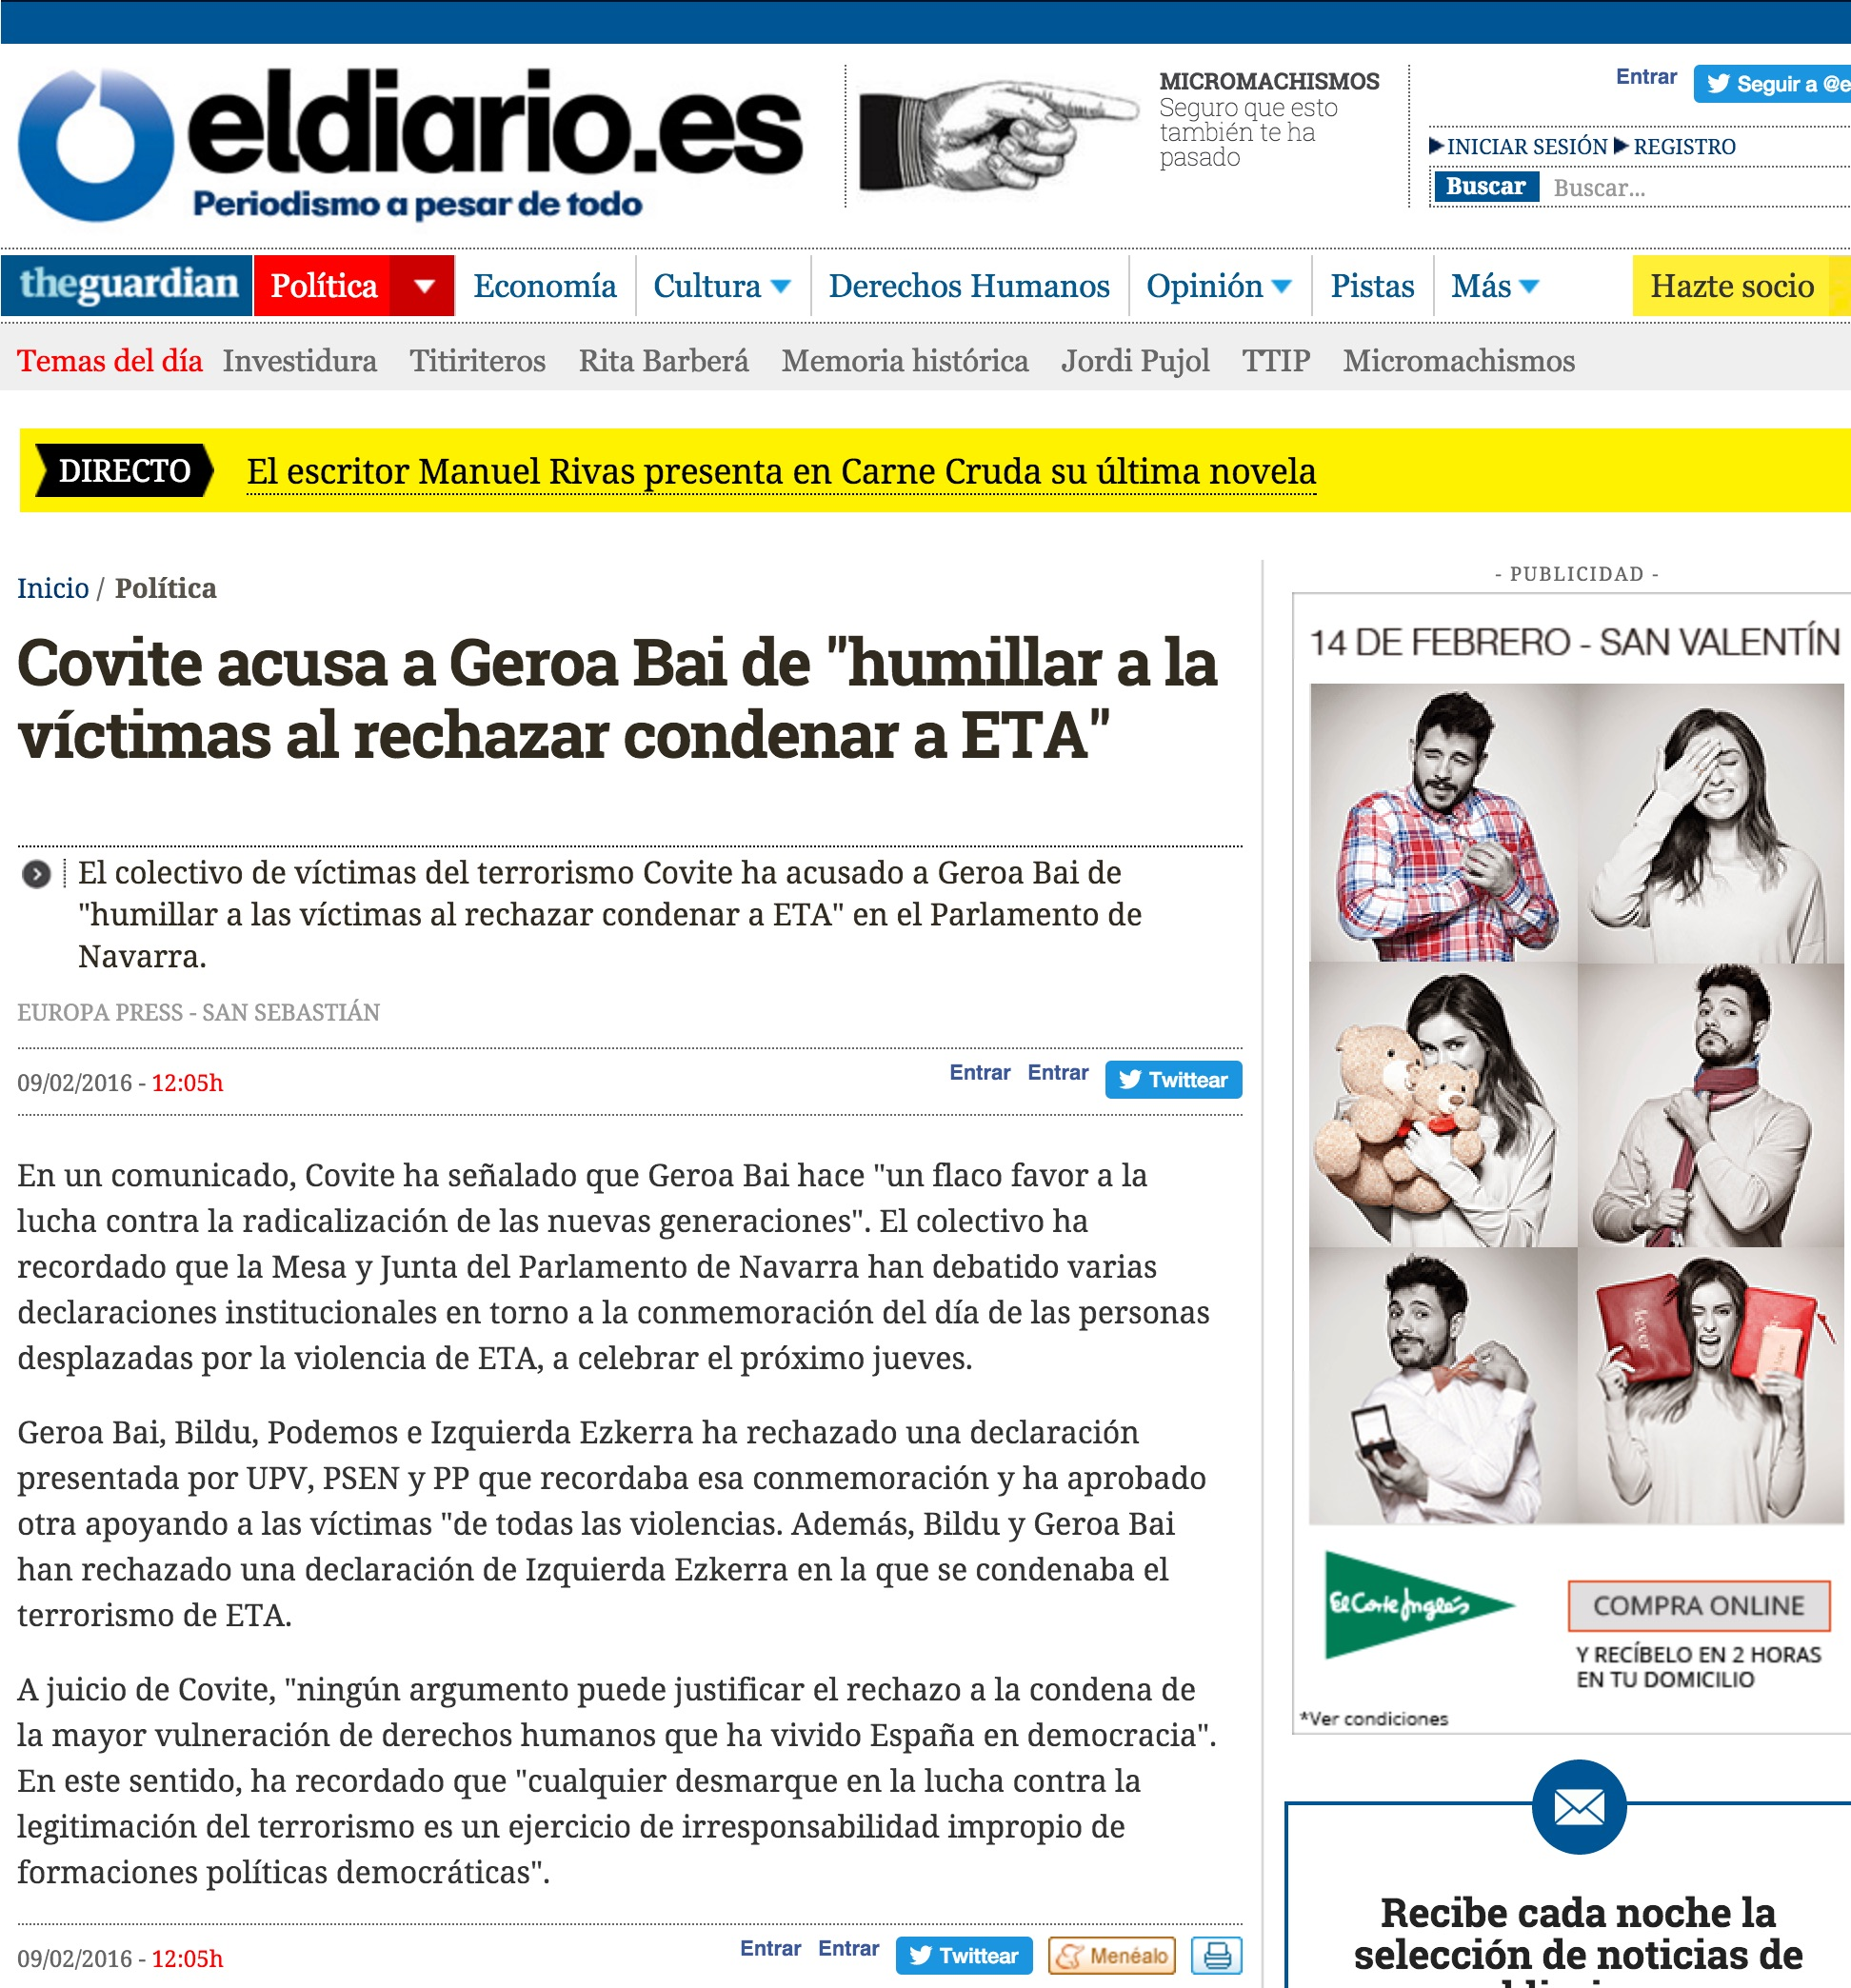 geroa_bai_eldiarioes